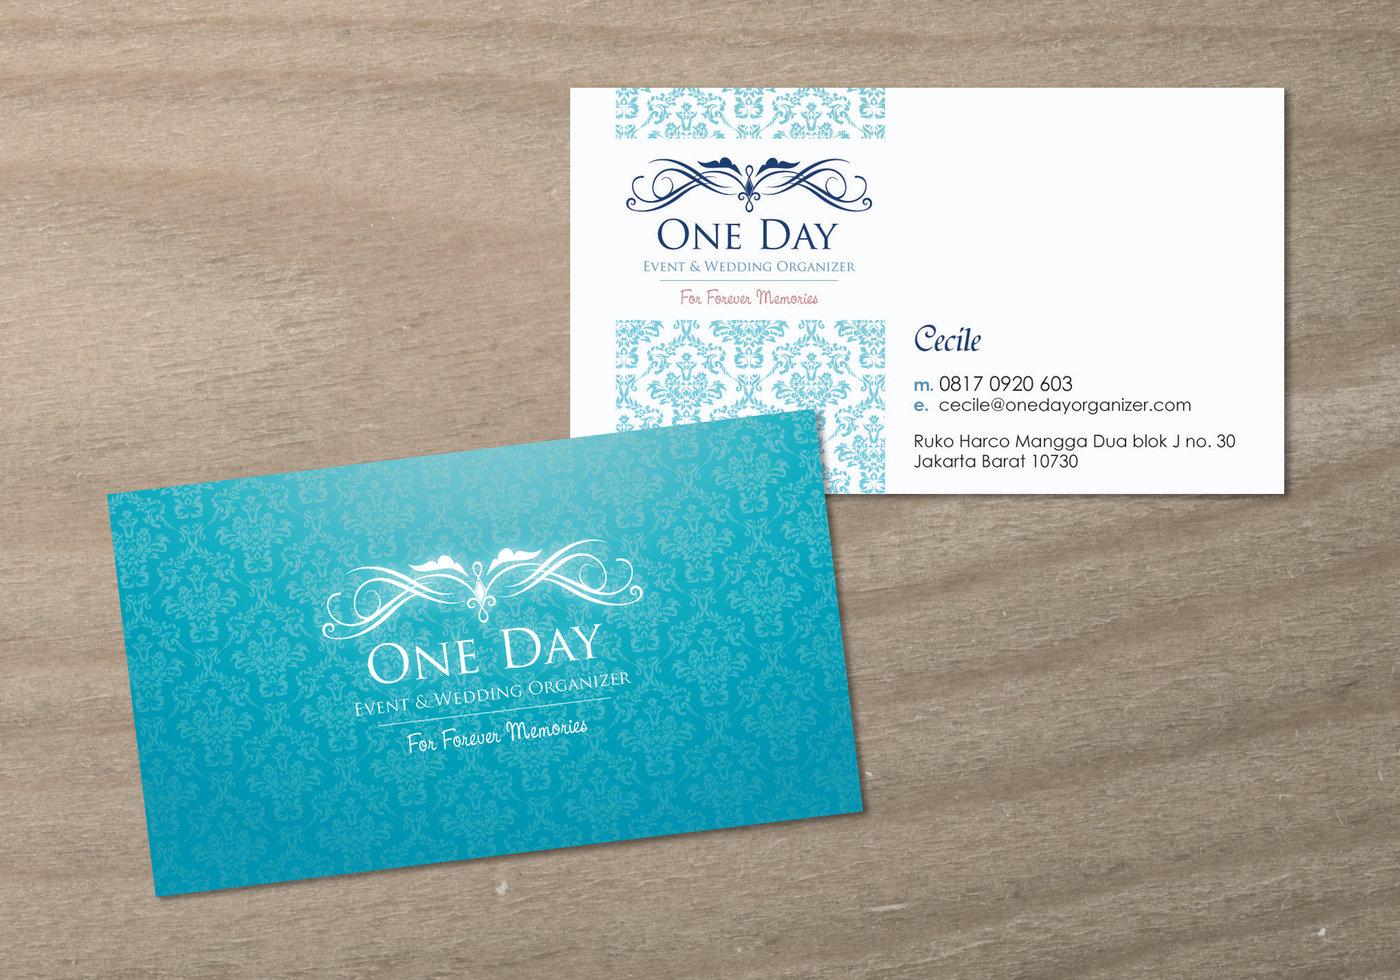 One Day - Business Card Design by Sherly Gunawan at Coroflot.com